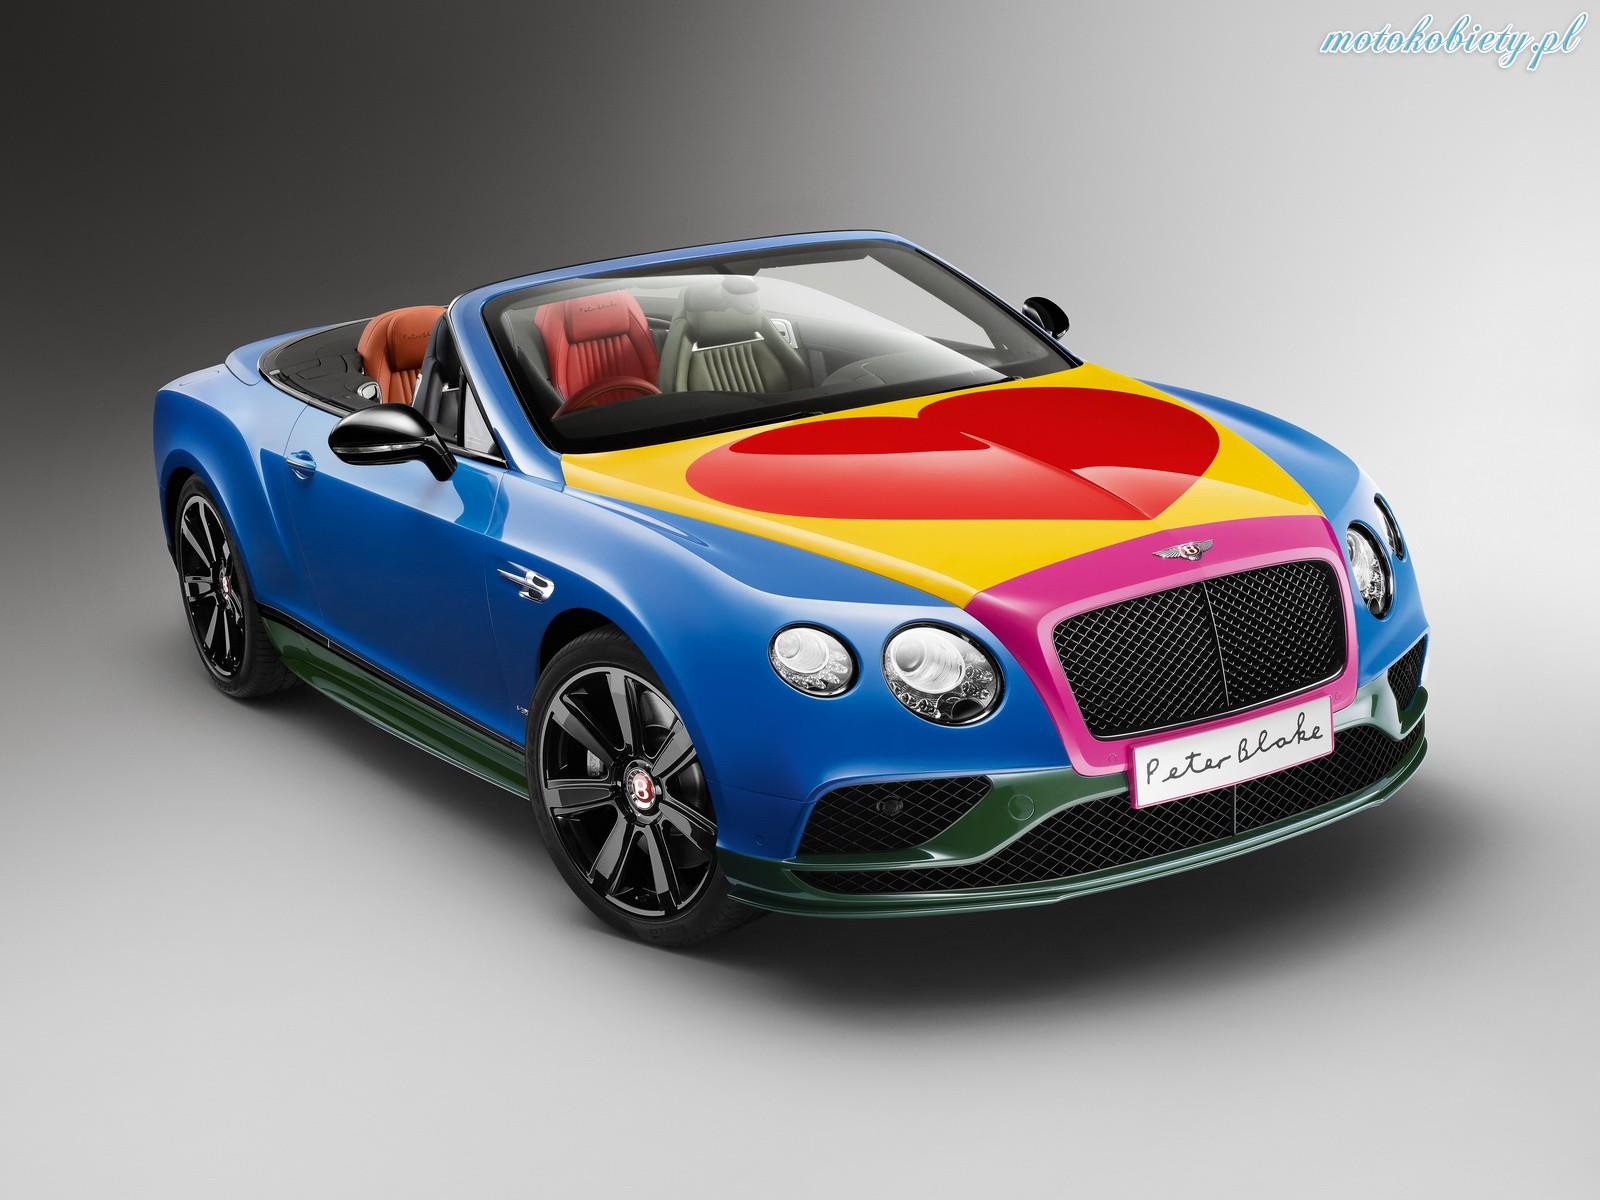 Bentley Continental Peter Blake